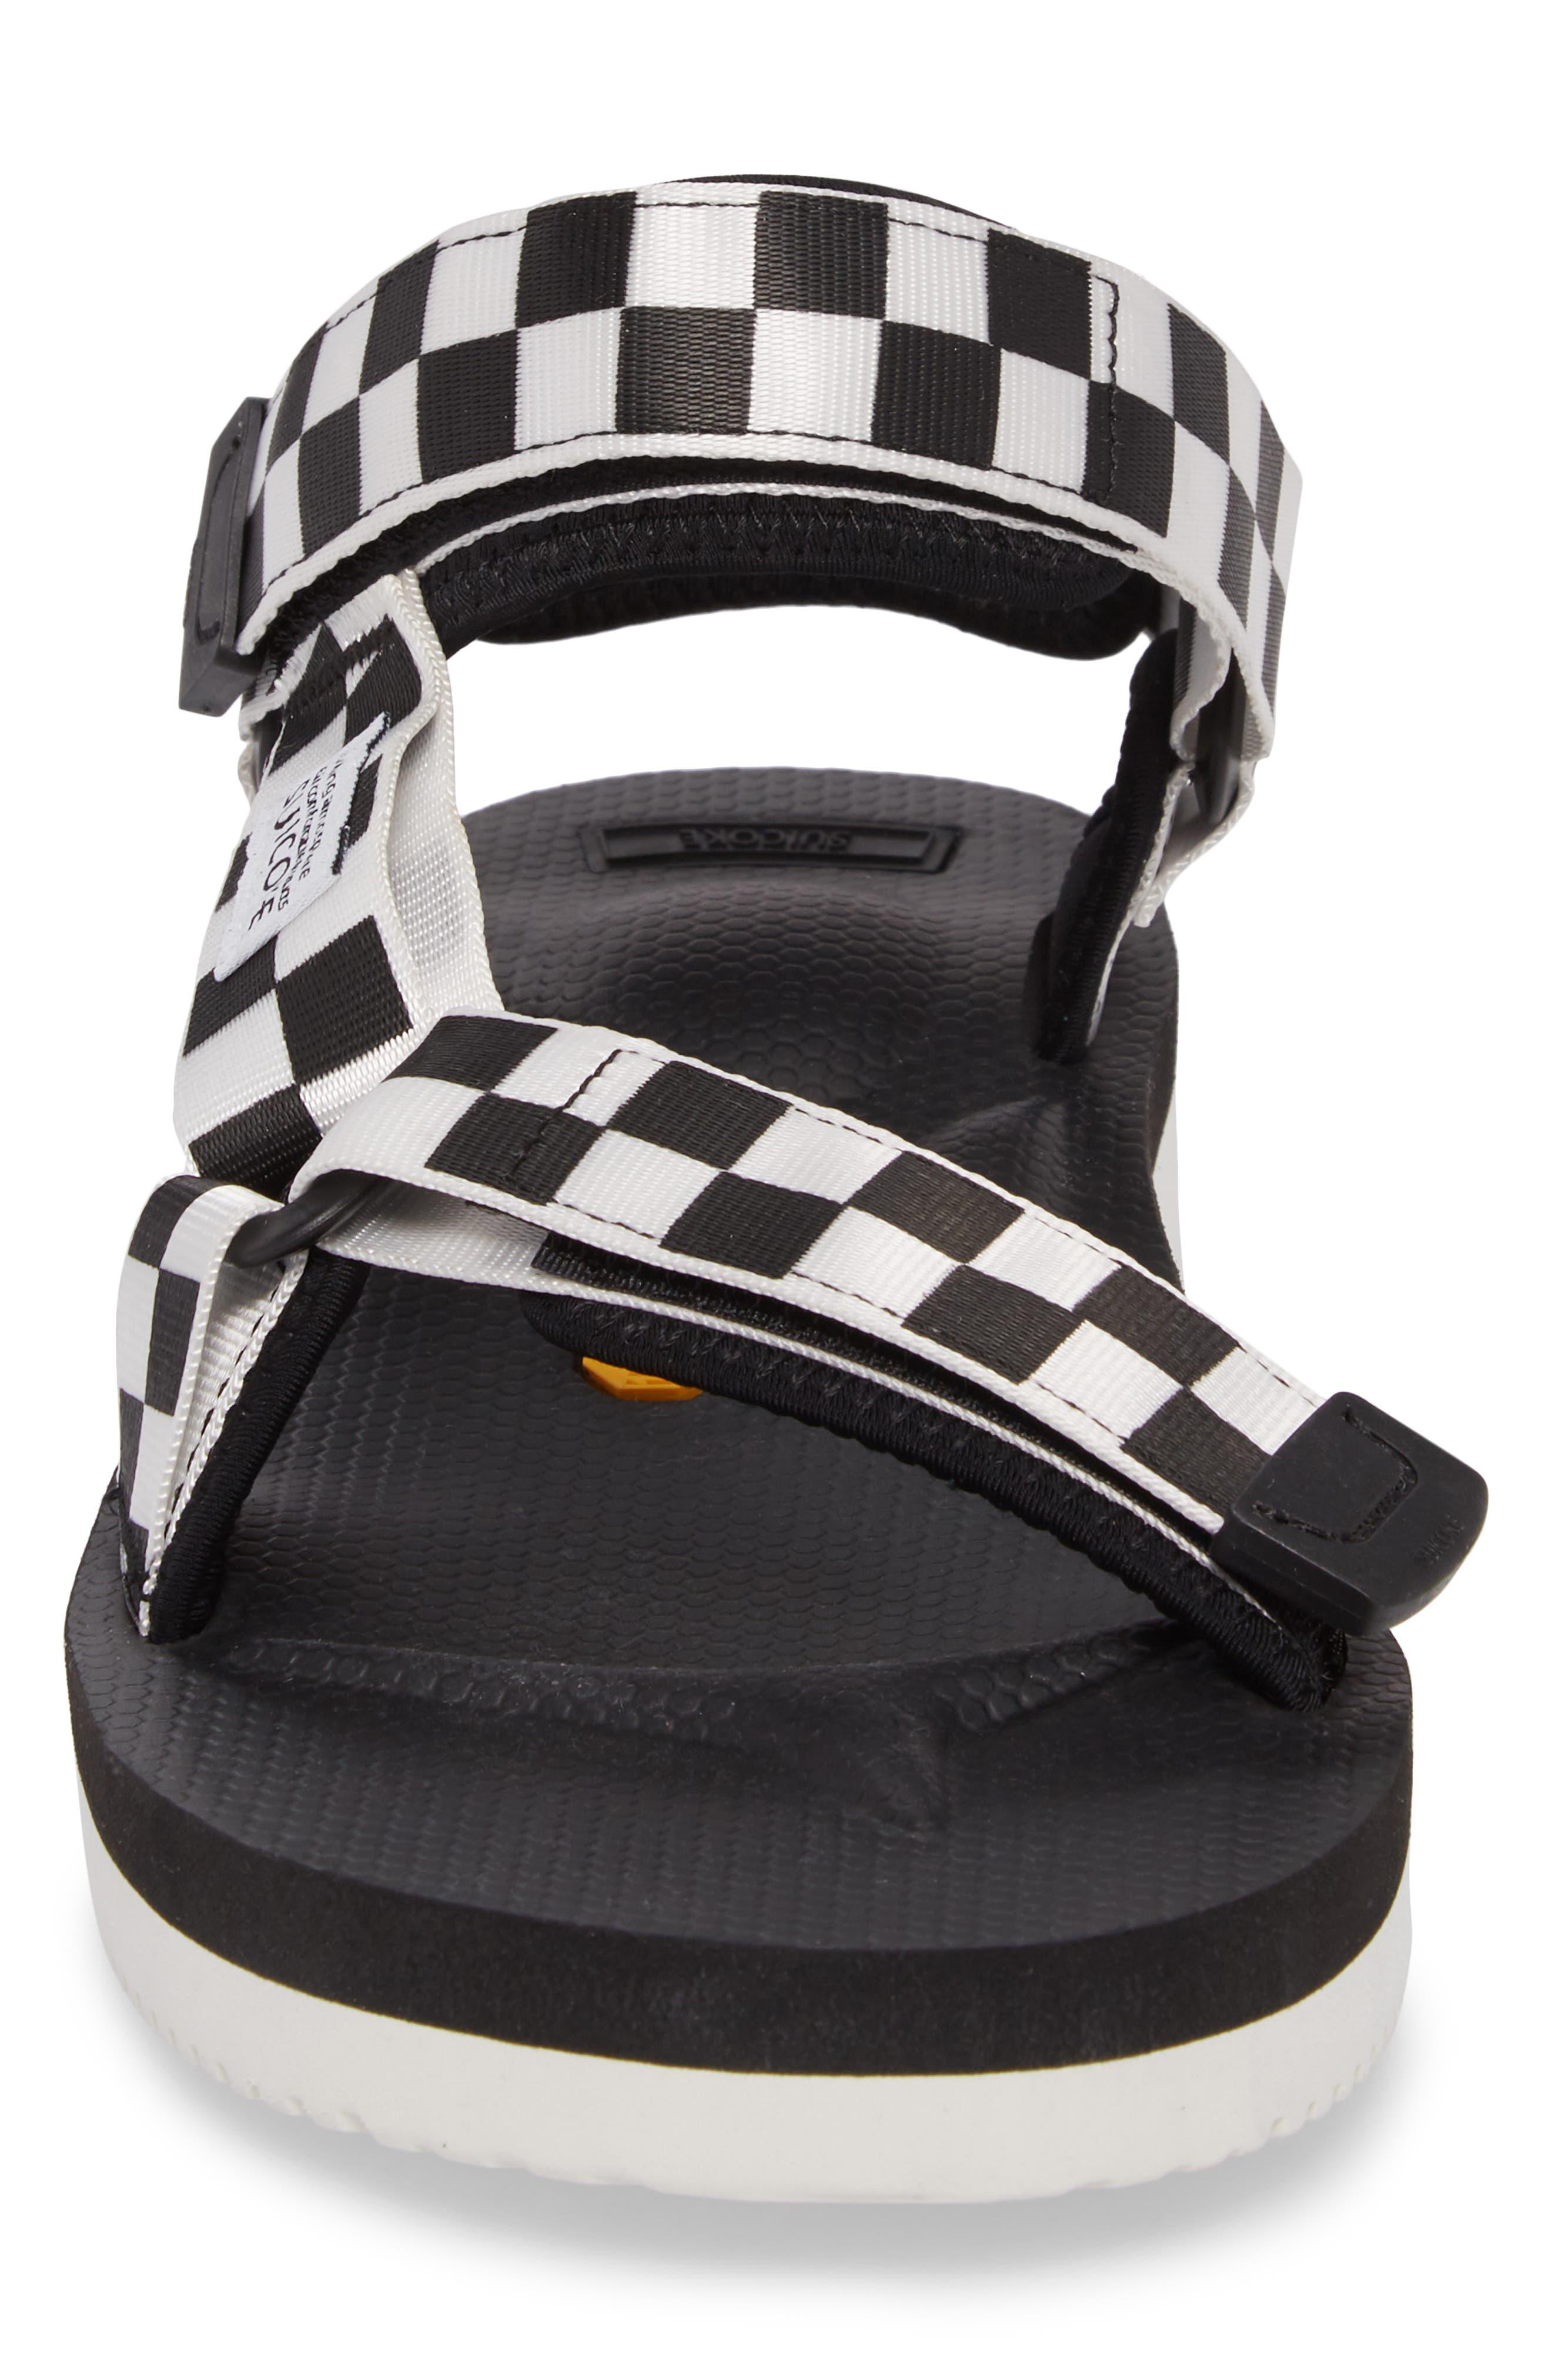 Depa Sport Sandal,                             Alternate thumbnail 4, color,                             BLACK